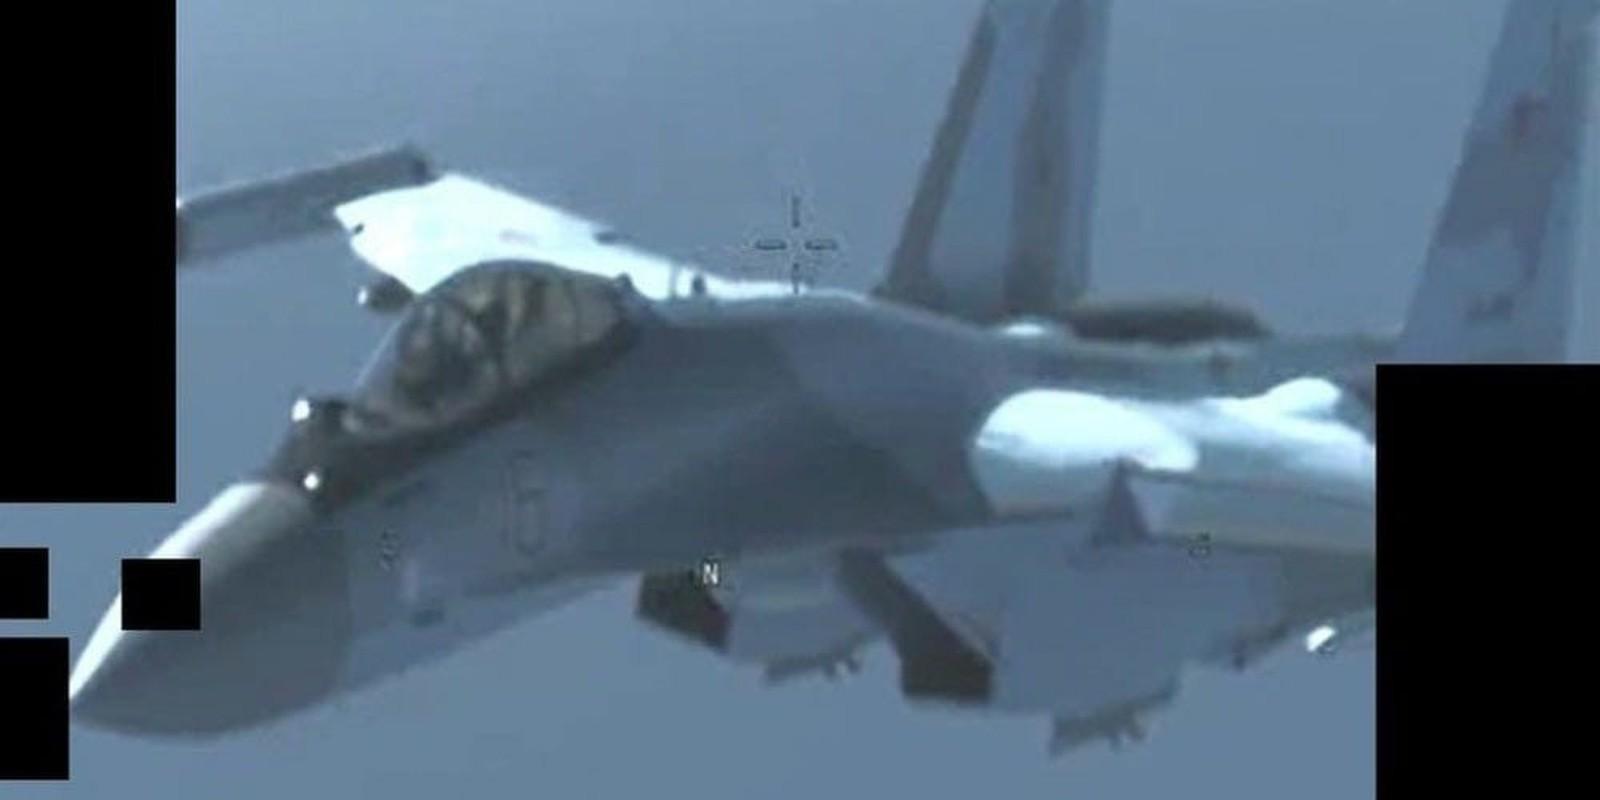 May bay nem bom T-22 Nga xuat hien o Libya khien My kinh ngac-Hinh-8